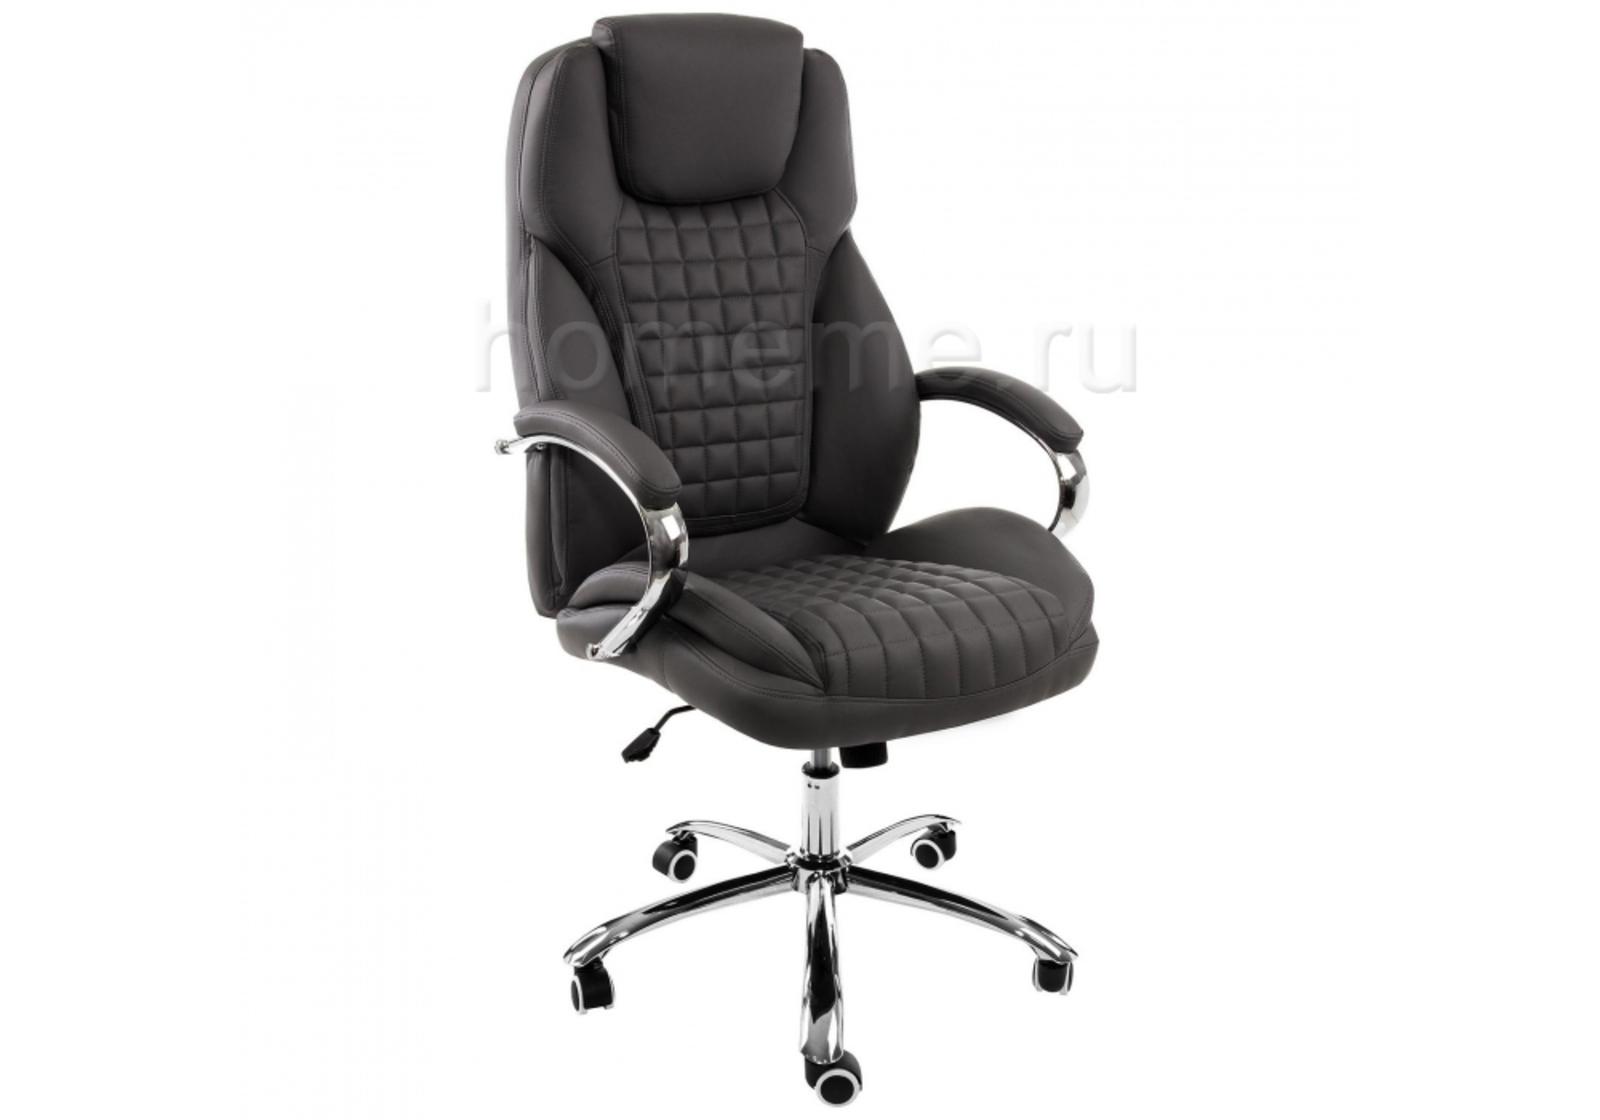 Кресло для офиса HomeMe Herd темно-серое 1868 от Homeme.ru